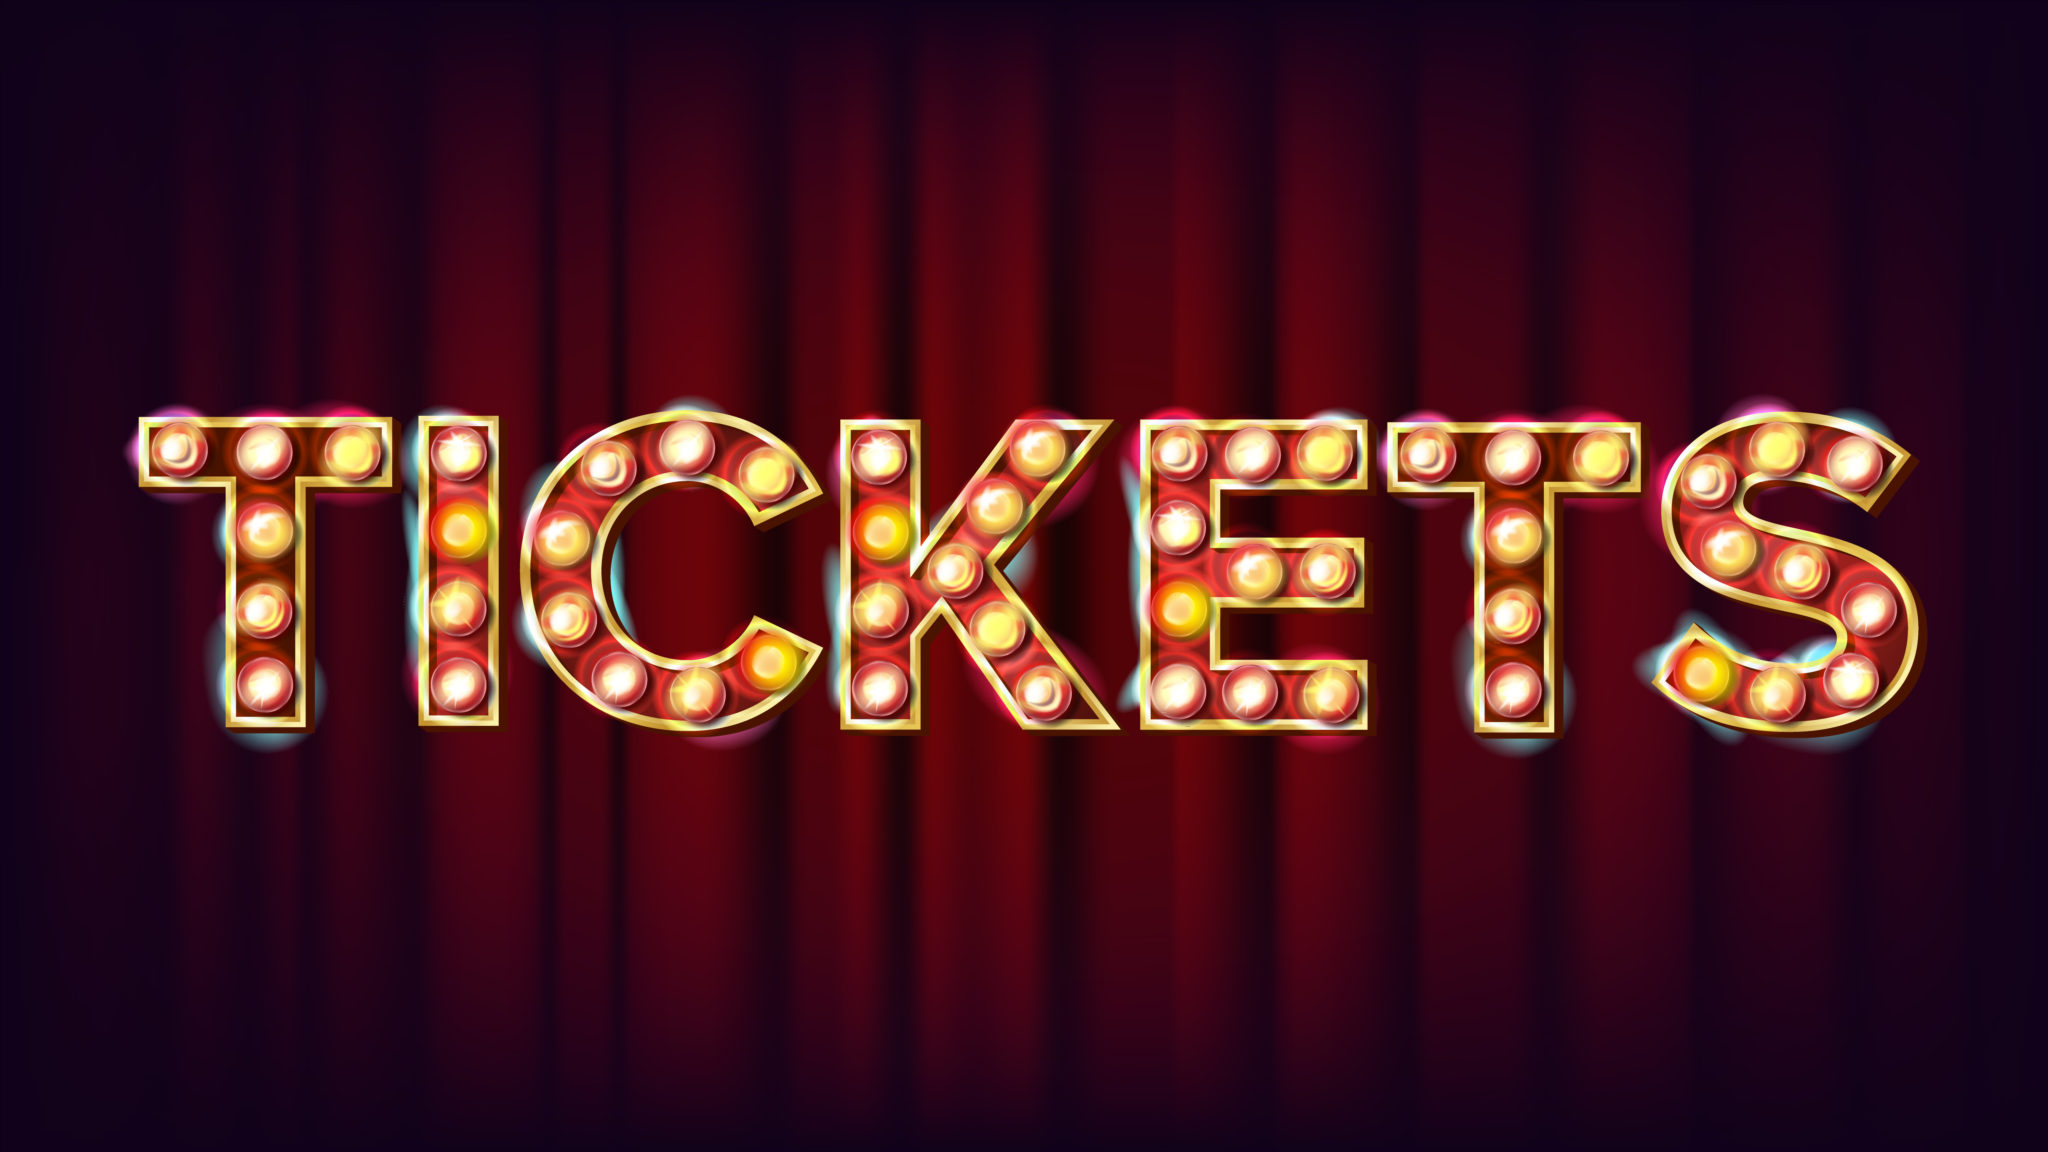 Tickets Banner Sign Vector. For Arts Festival Events Design. Circus Vintage Golden Illuminated Neon Light. Illustration